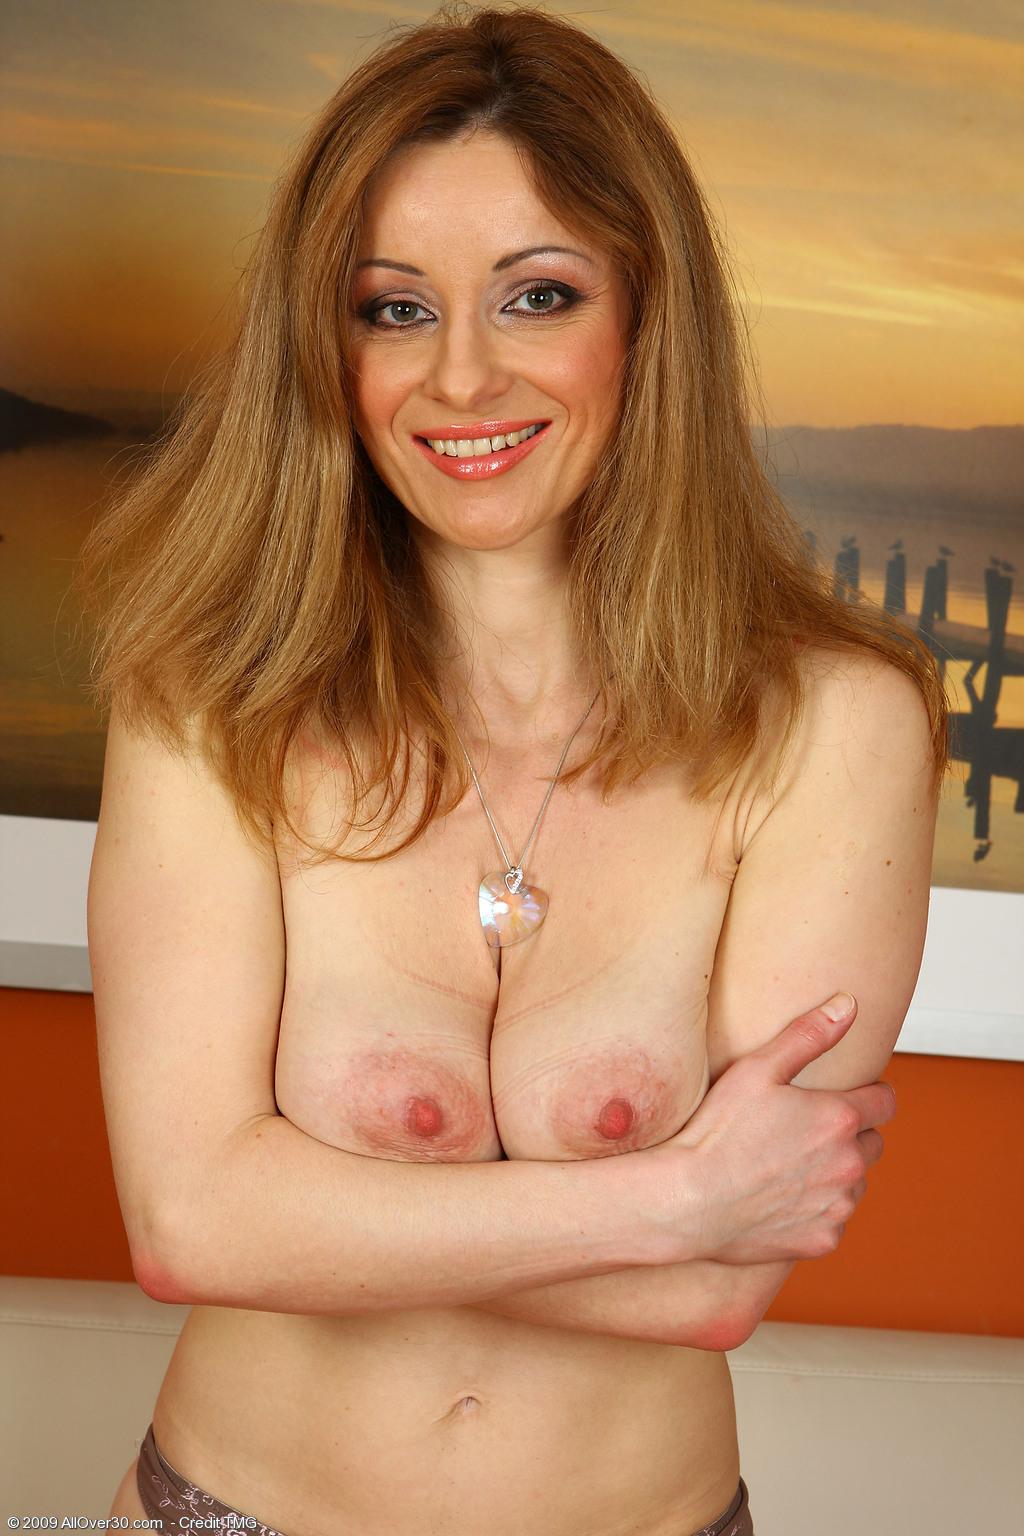 Valerie pussy